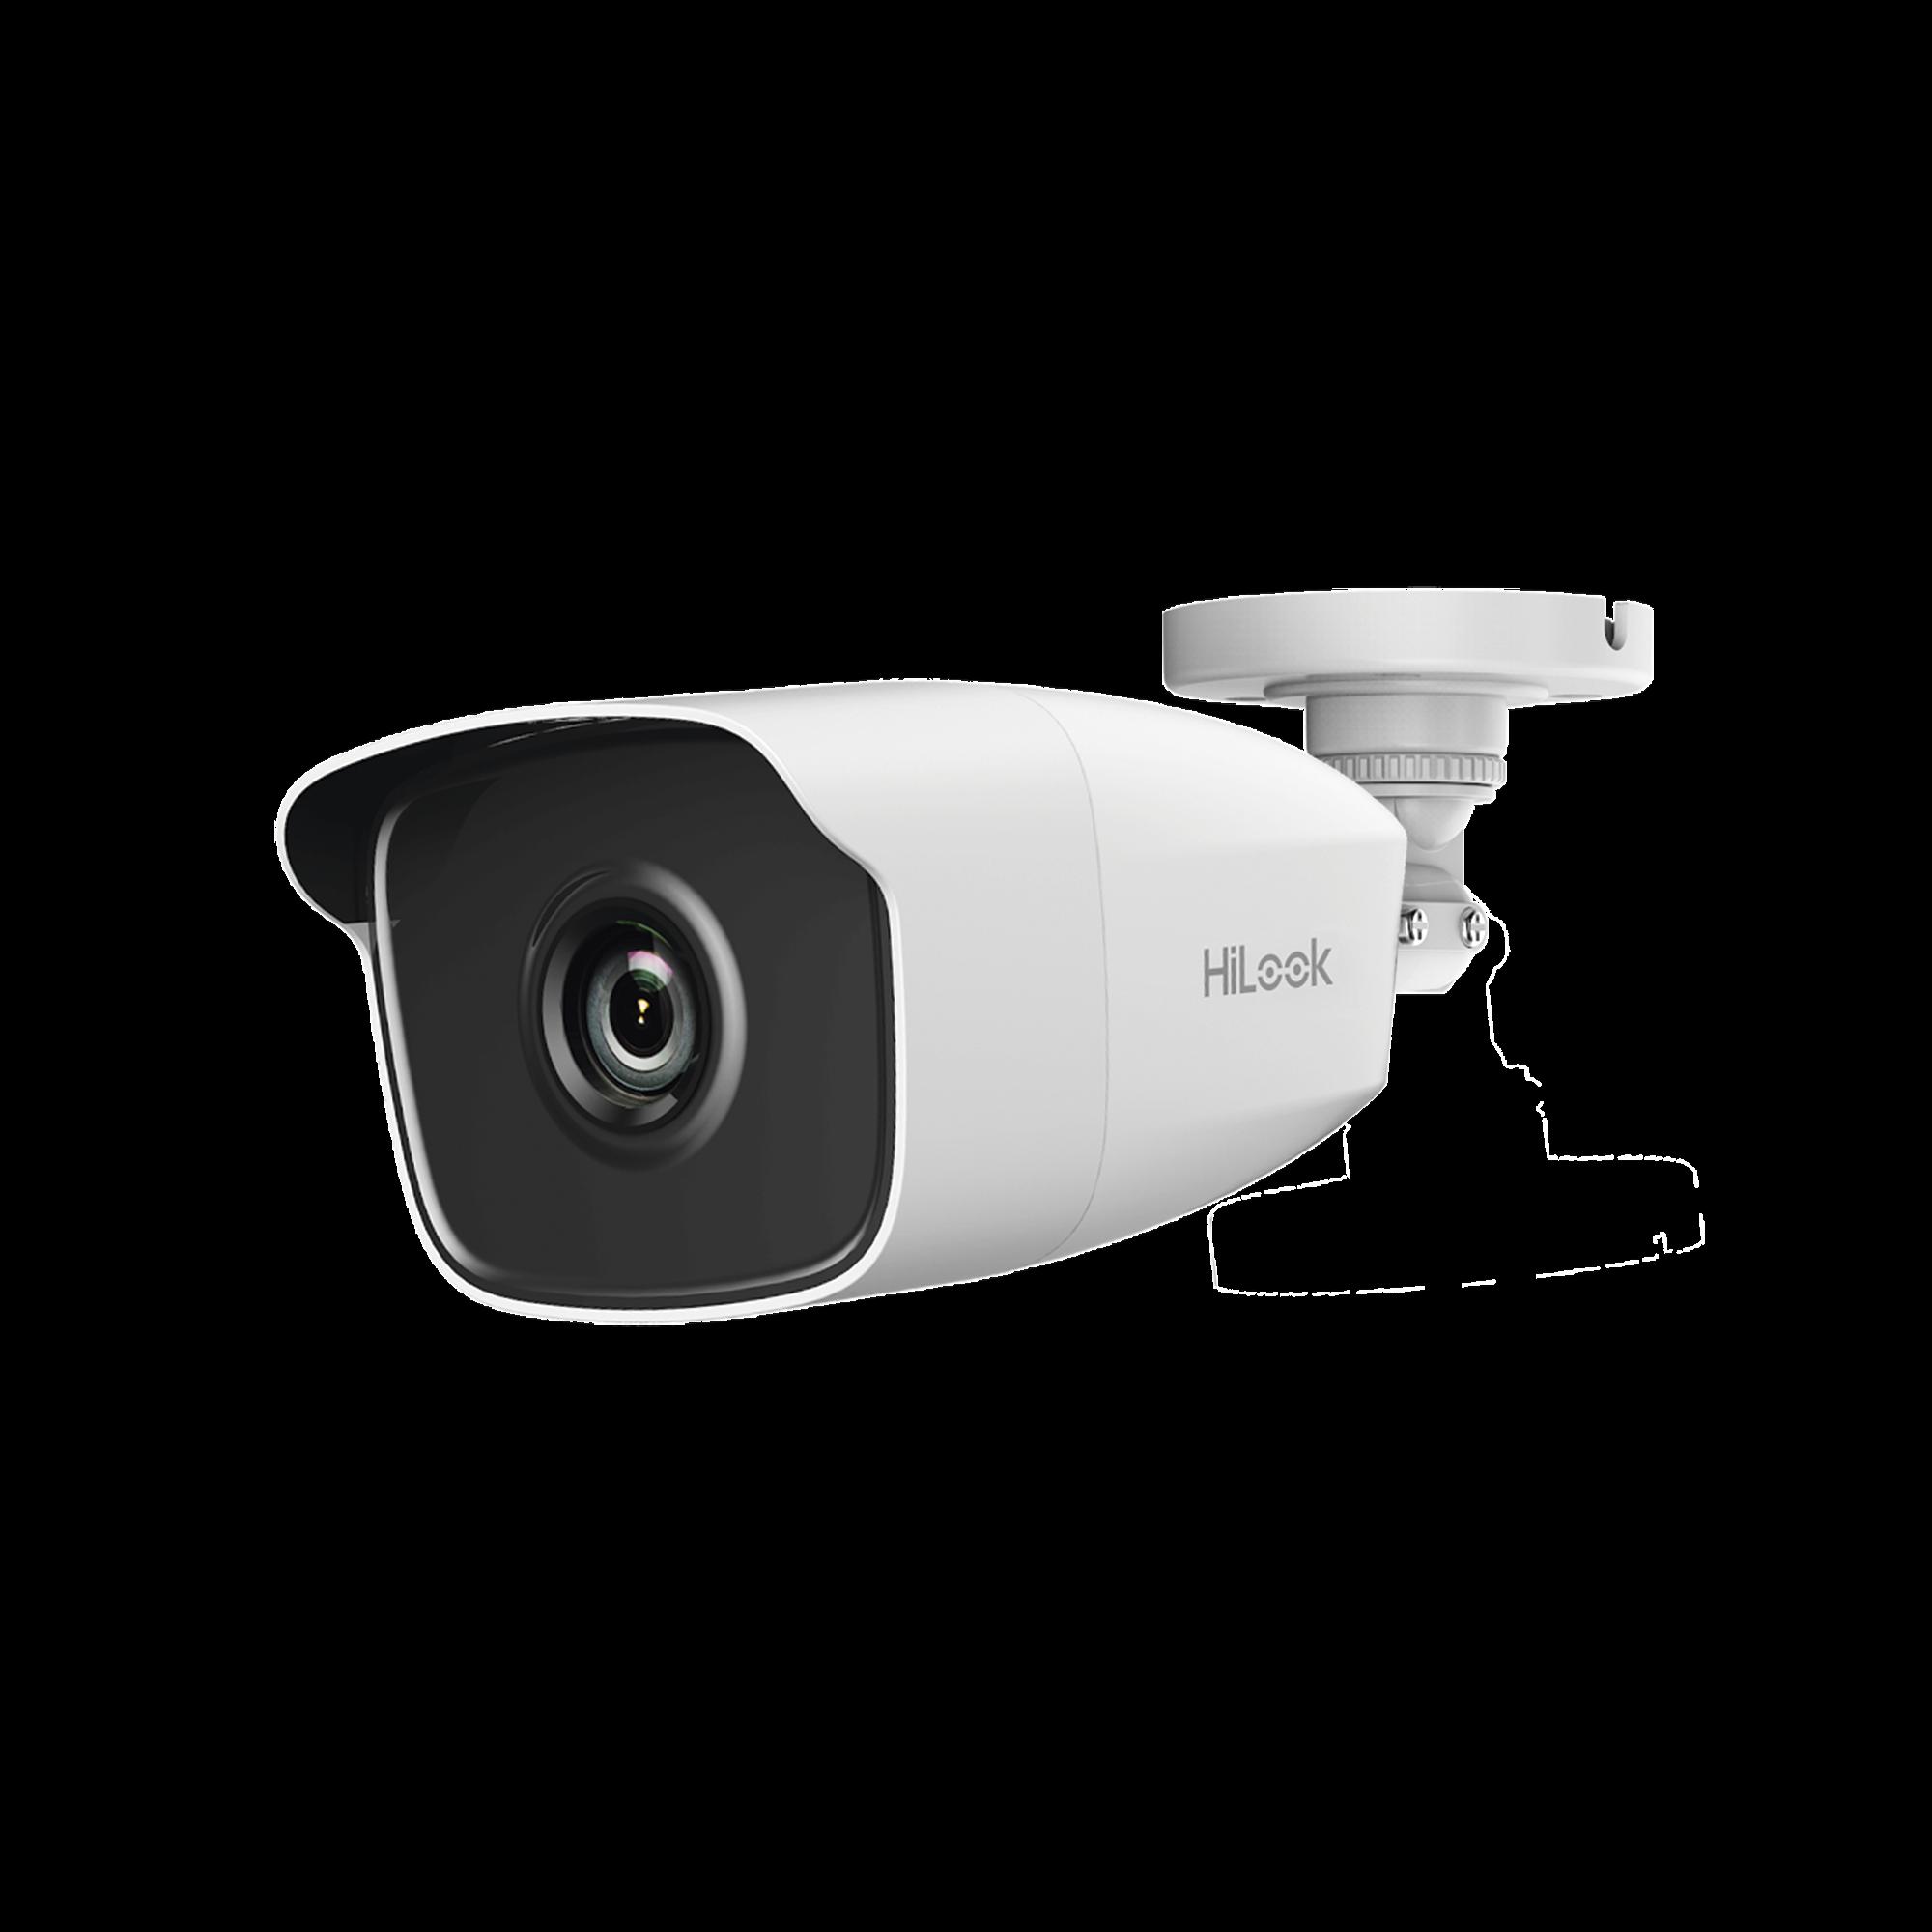 Bala TURBOHD 1080p / Gran Angular 103? / Lente 2.8 mm / METAL / IR EXIR Inteligente 40 mts / Exterior IP66 / TVI-AHD-CVI-CVBS / dWDR